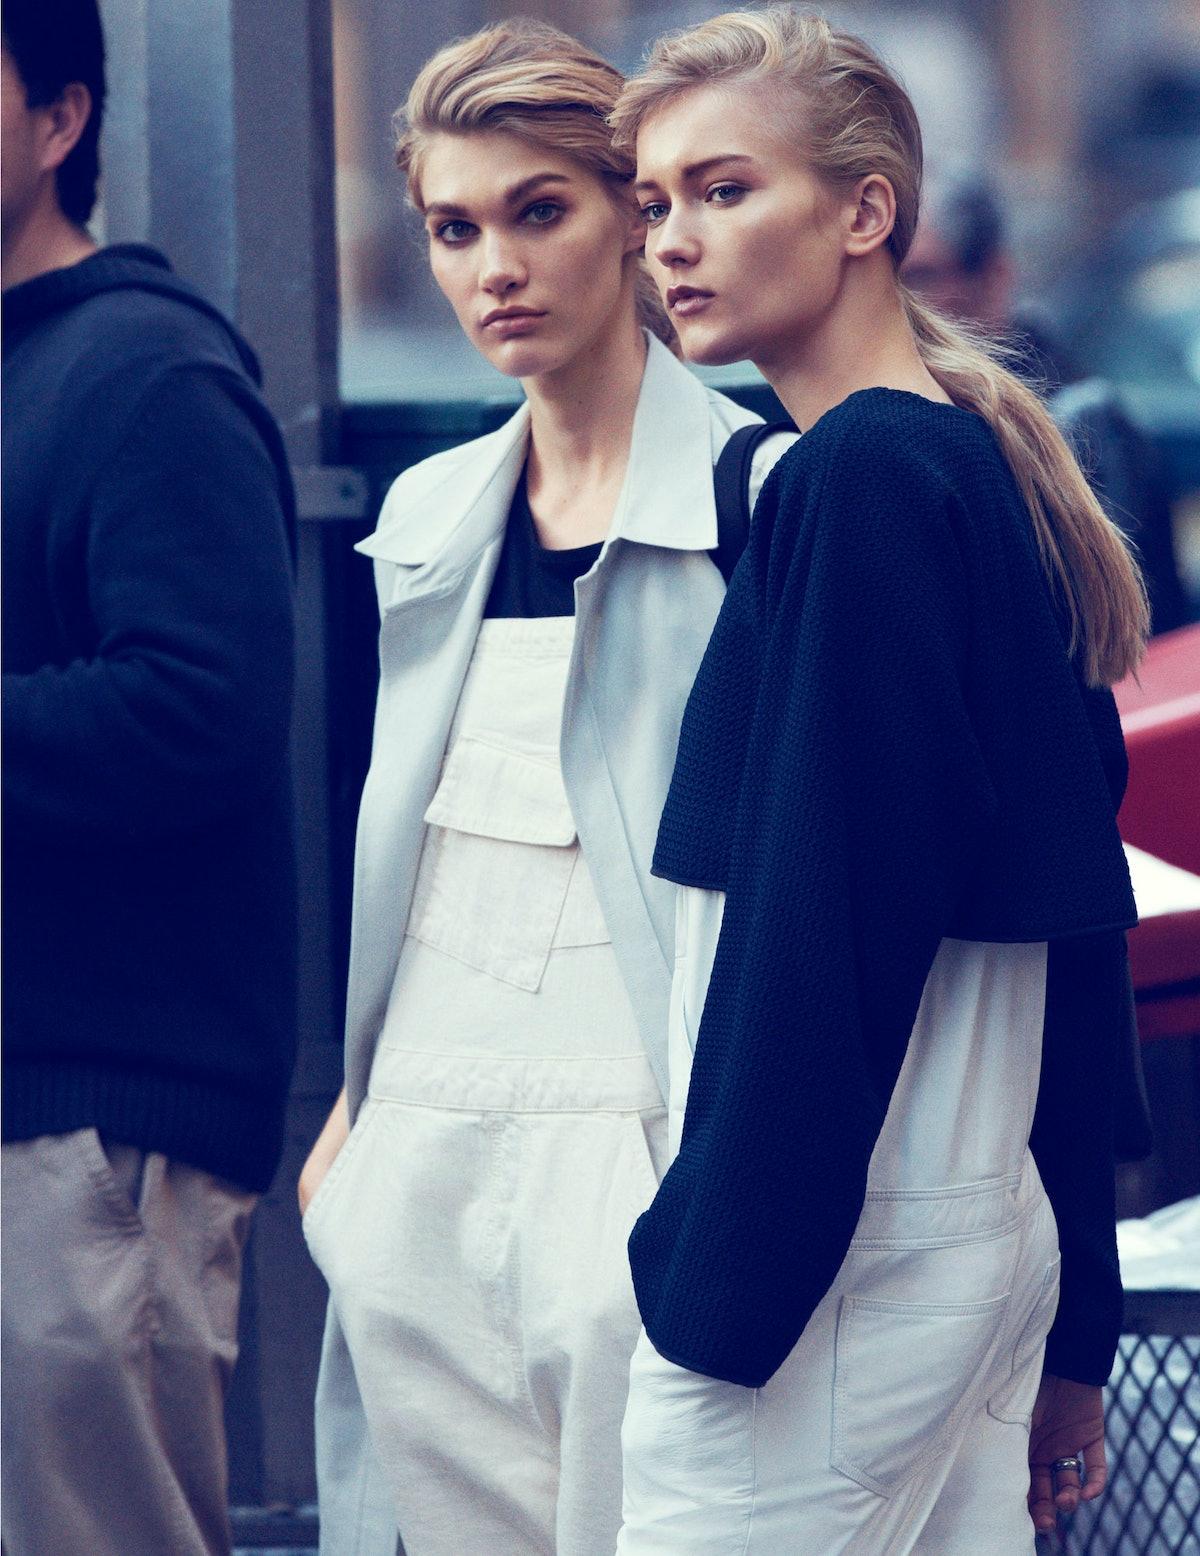 BCBG Max Azria coat; Kate Spade Saturday overalls; T by Alexander Wang T-shirt; Furla backpack. 10 C...